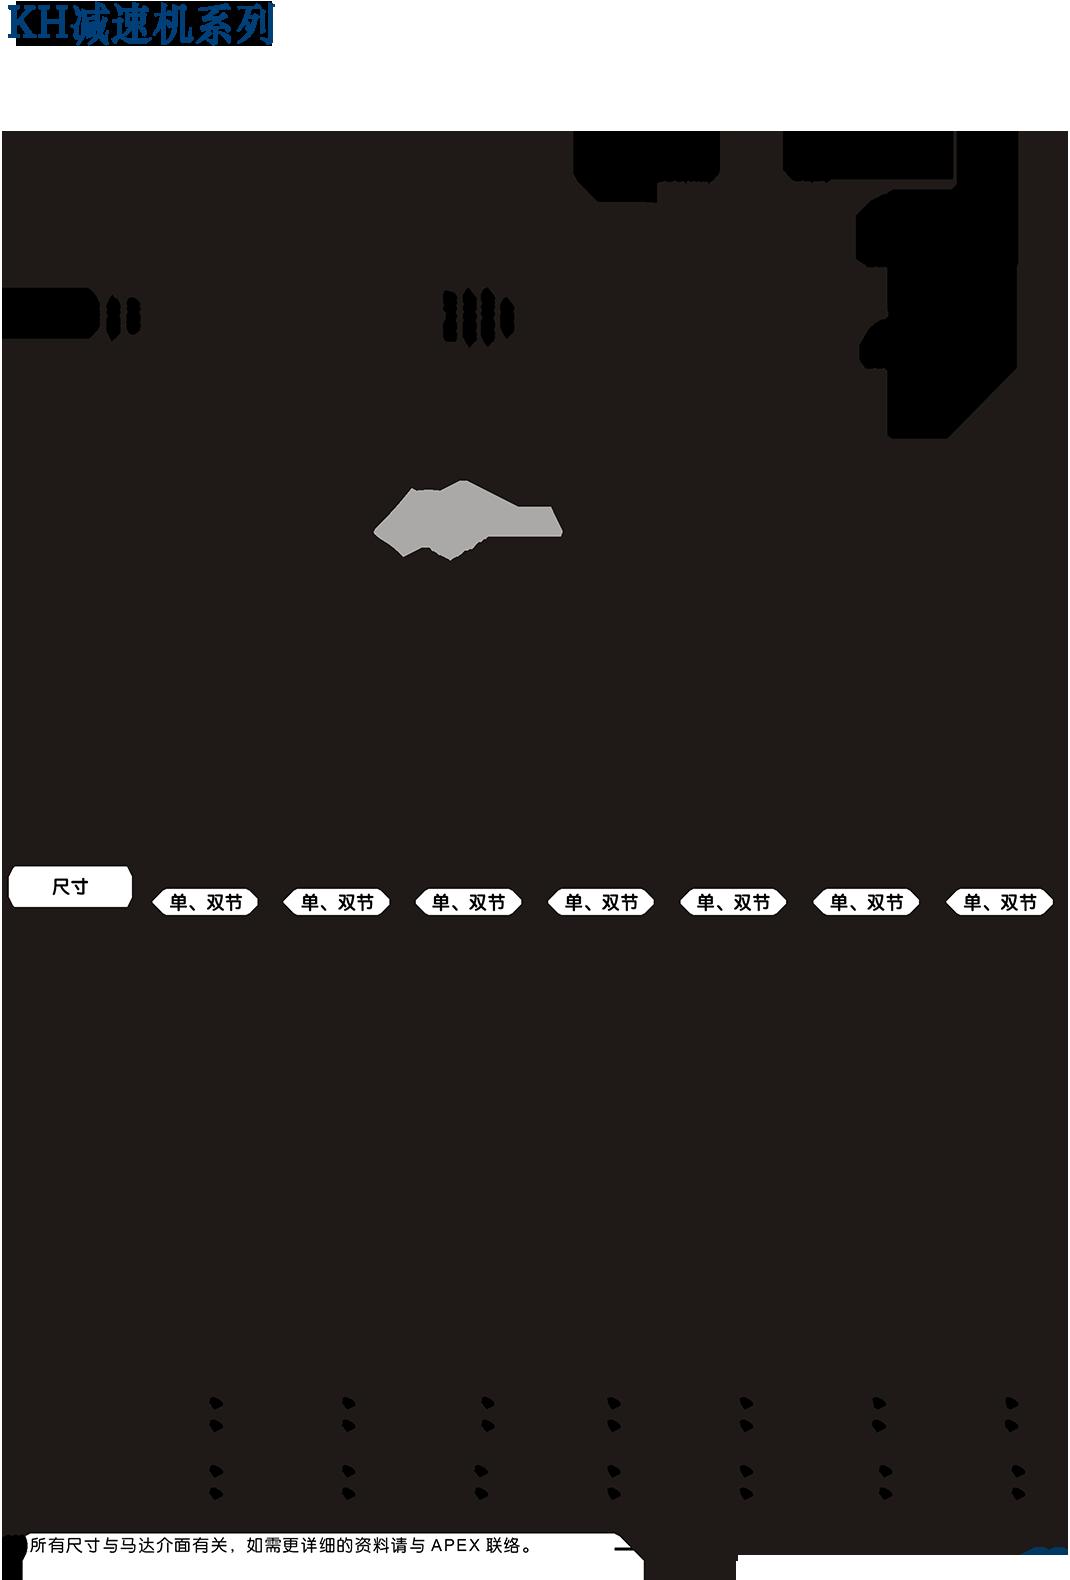 KH-台wan精锐齿轮箱.png